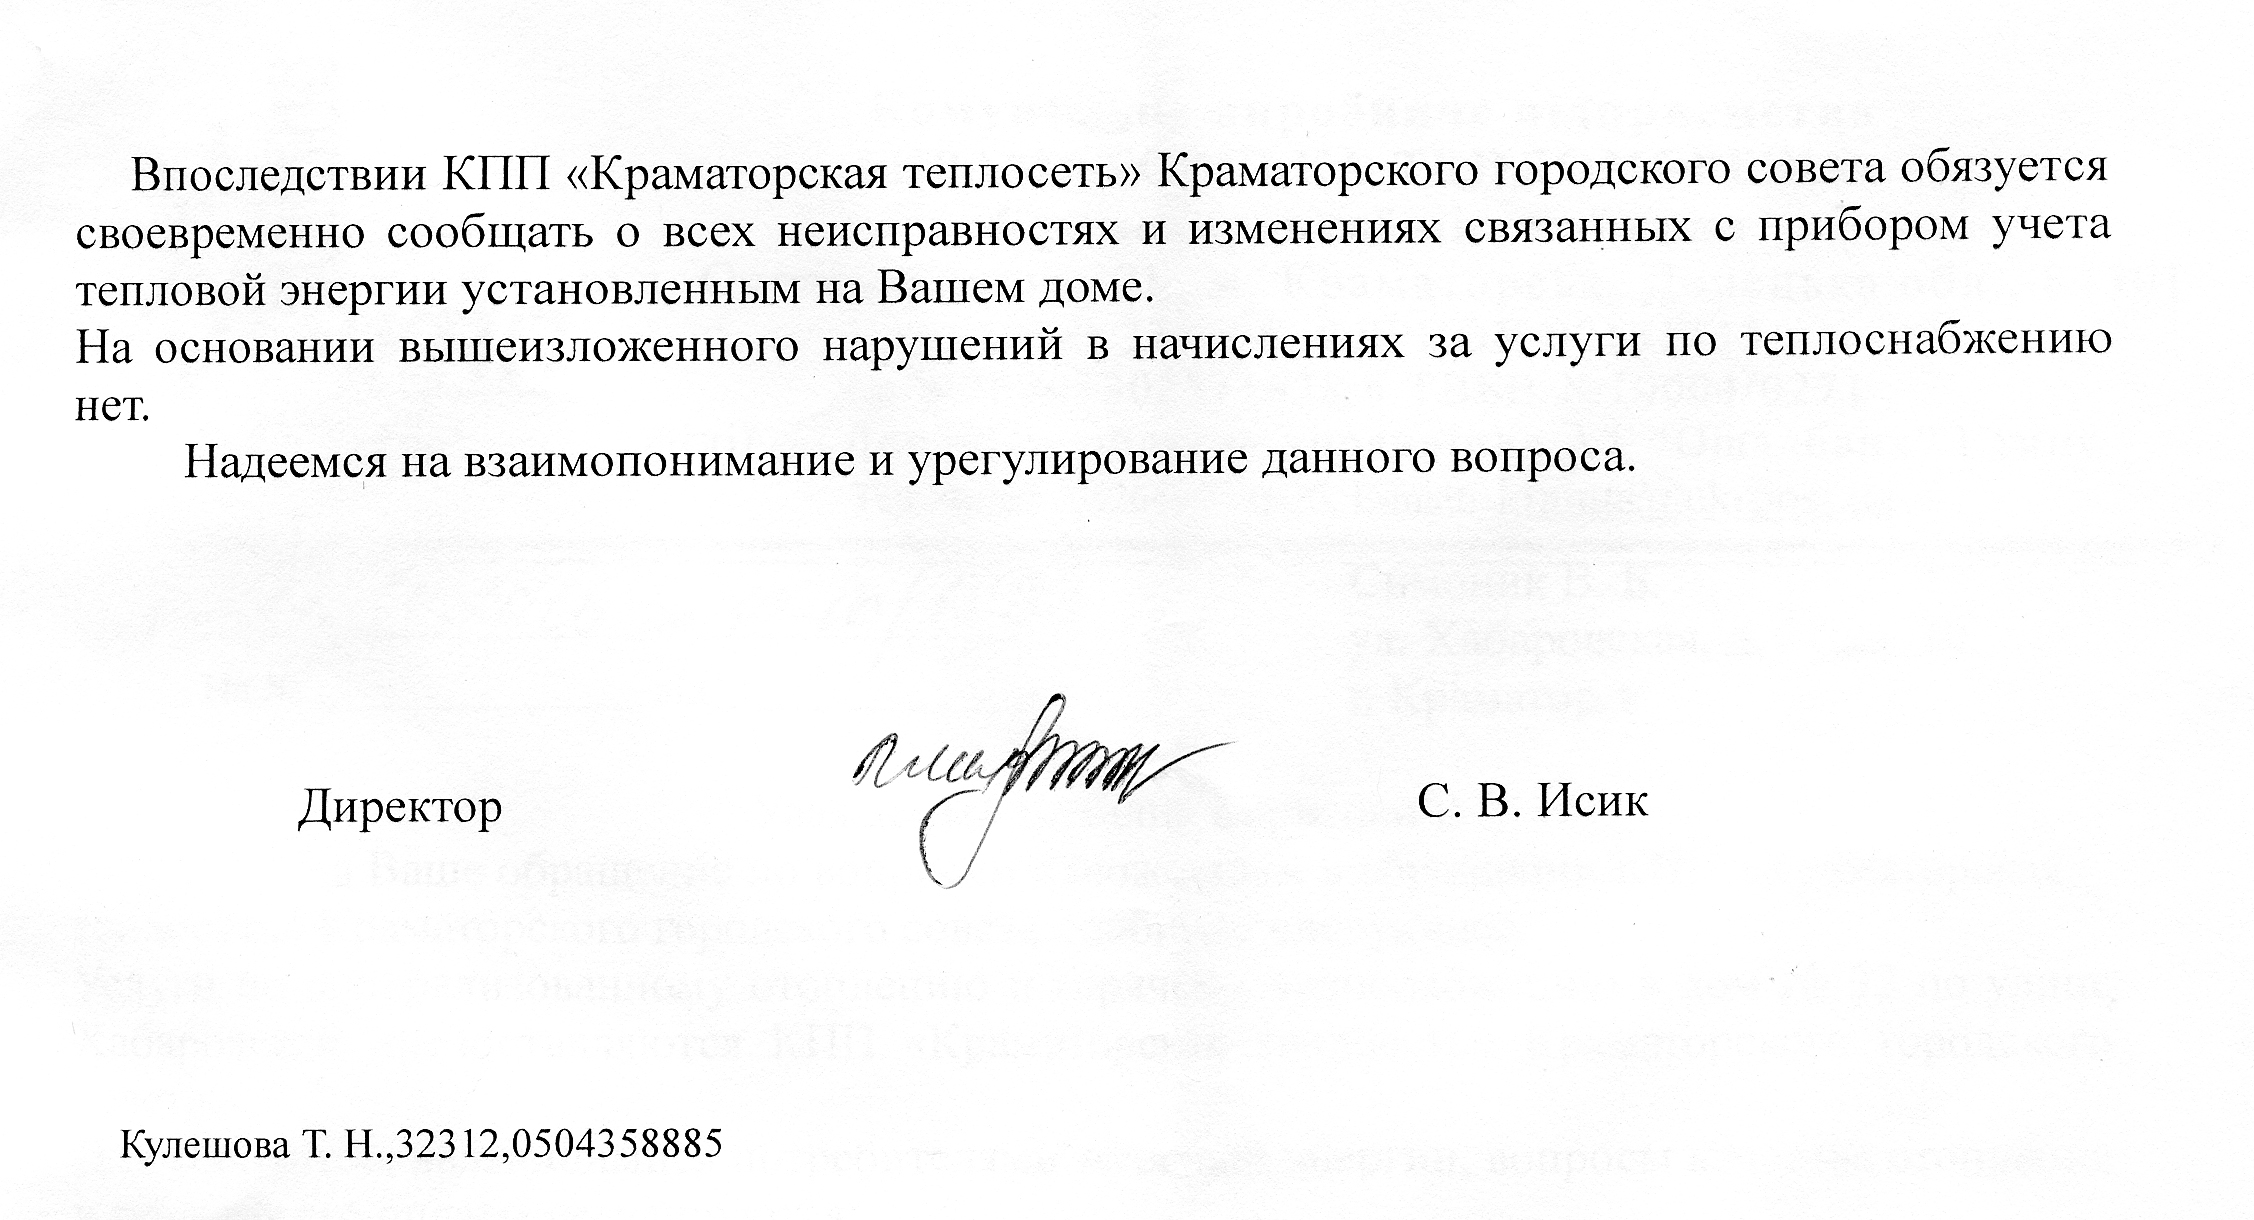 https://img-fotki.yandex.ru/get/54522/248142895.0/0_180fb4_93cc9c4a_orig